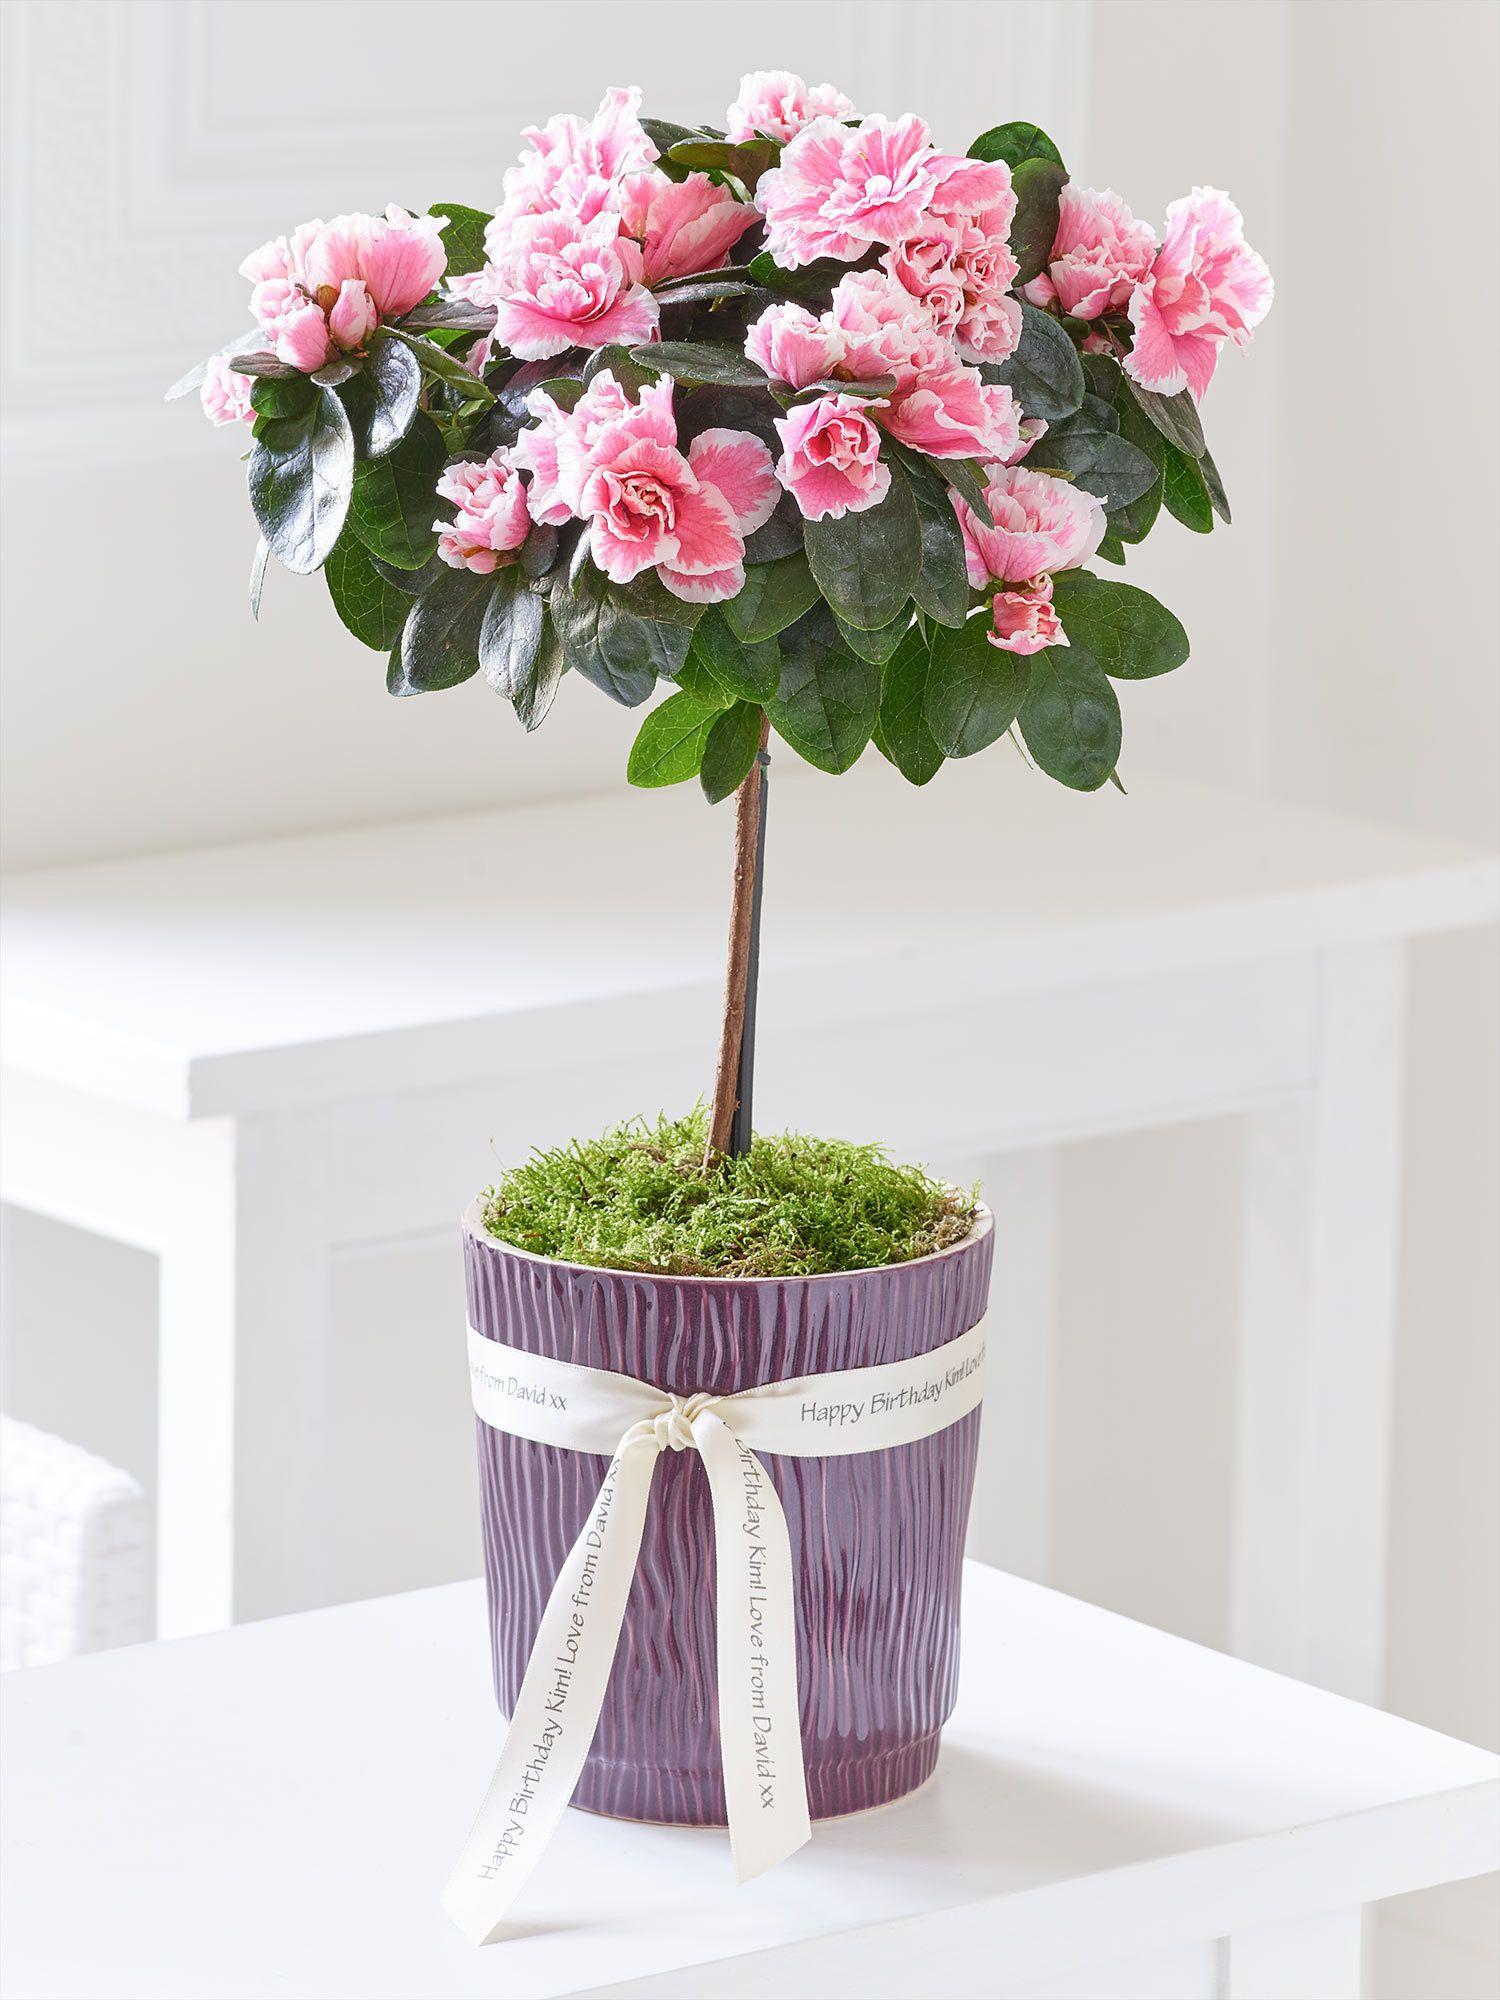 Product Image Flowers delivered, Order flowers online